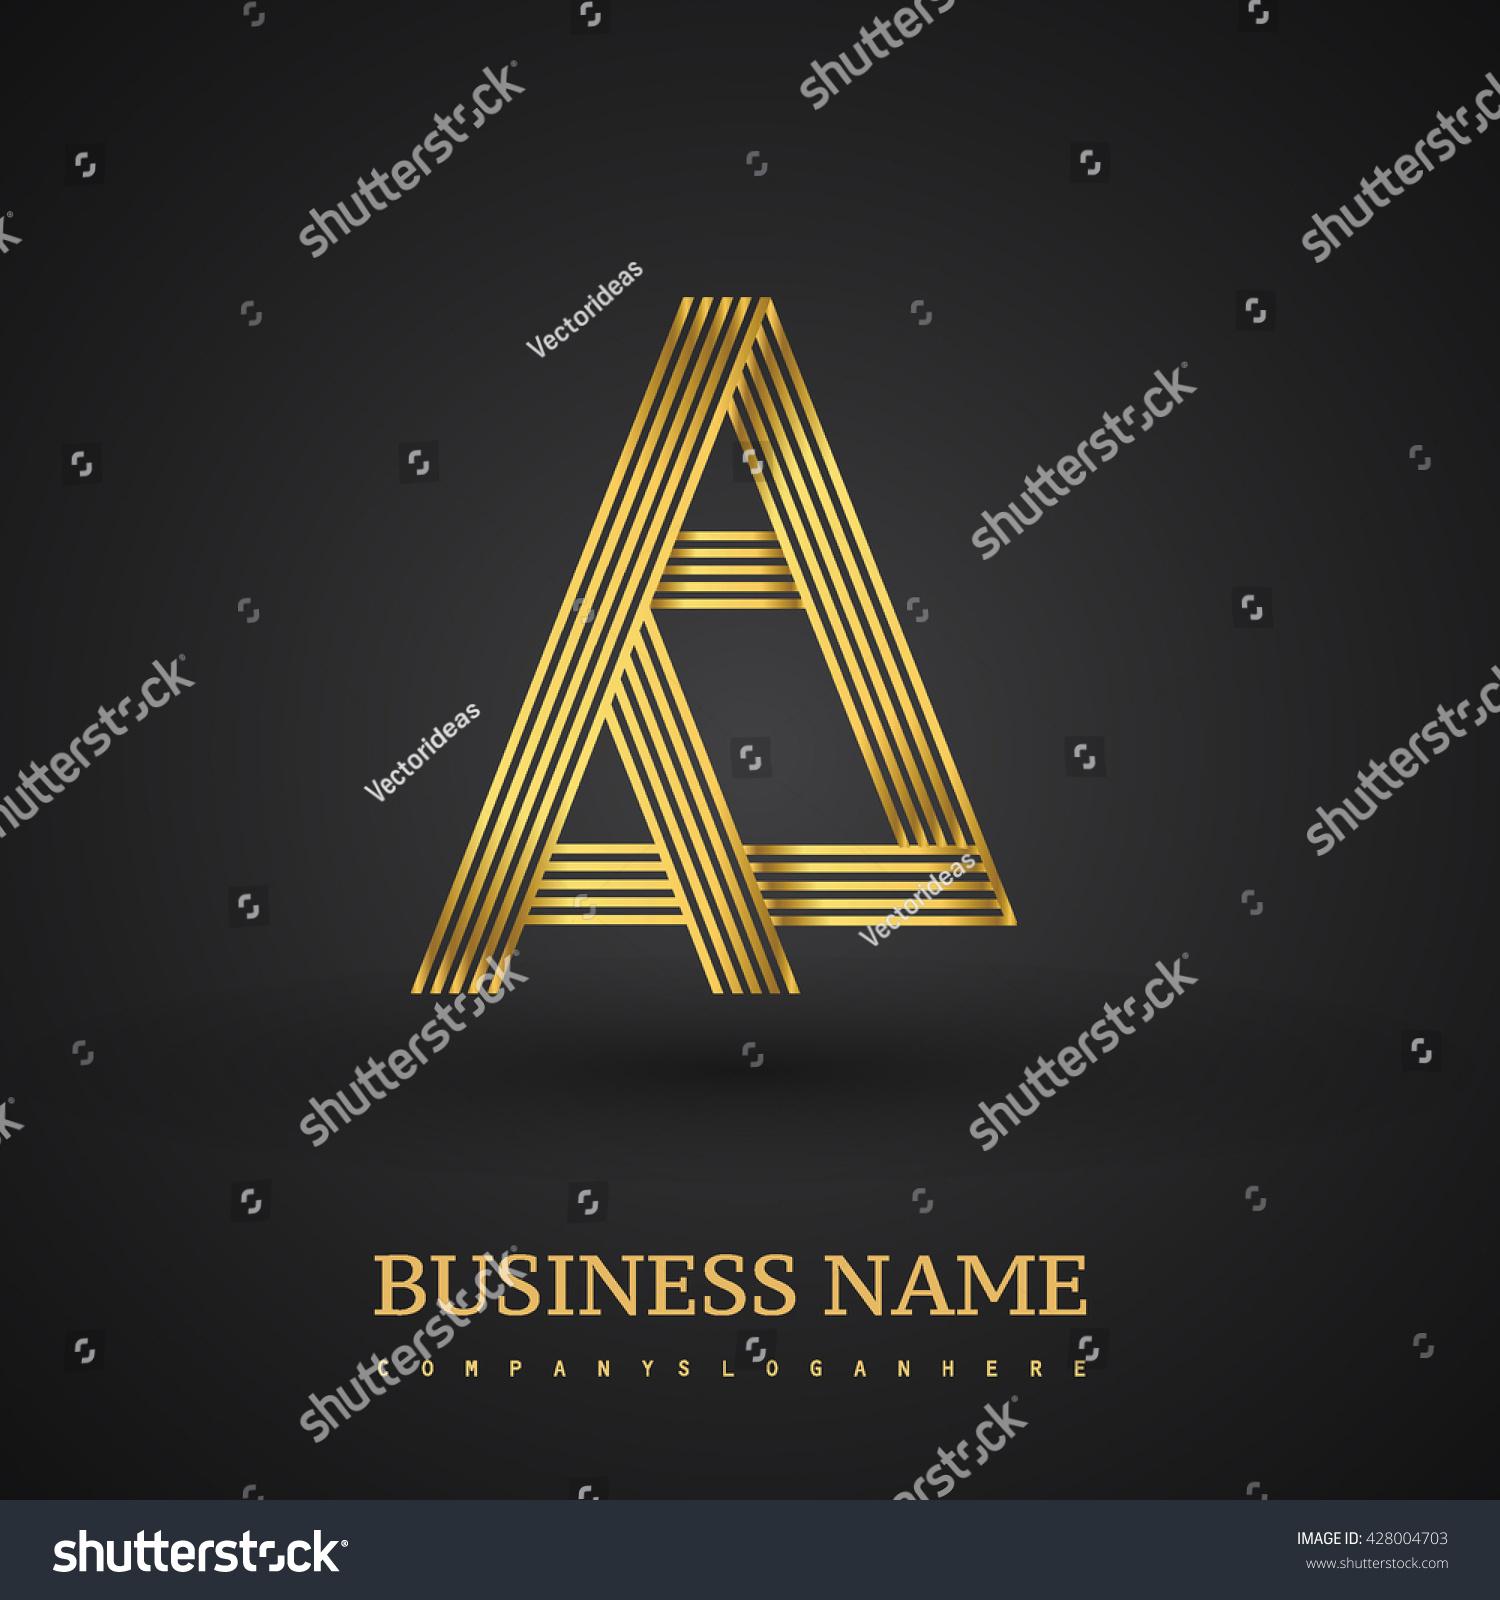 Letter aa linked logo design elegant stock vector 428004703 letter aa linked logo design elegant golden colored symbol for your business or company identity buycottarizona